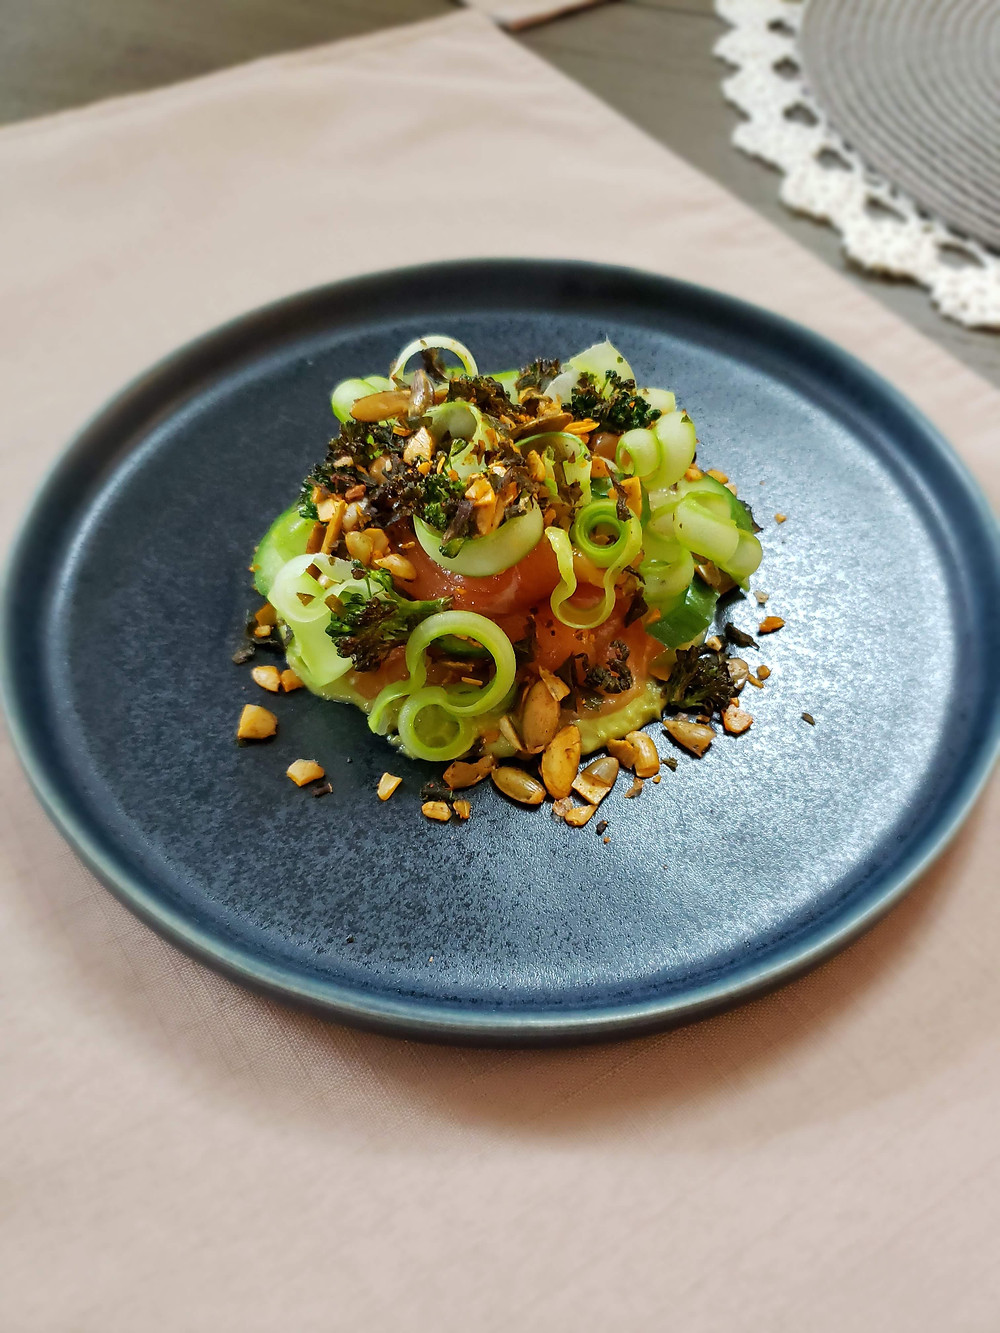 Pickled Avocado | Cucumber | Charred Broccoli Florets | Broccoli Stem Curls | Pumpkin Seed & Kale Crunch